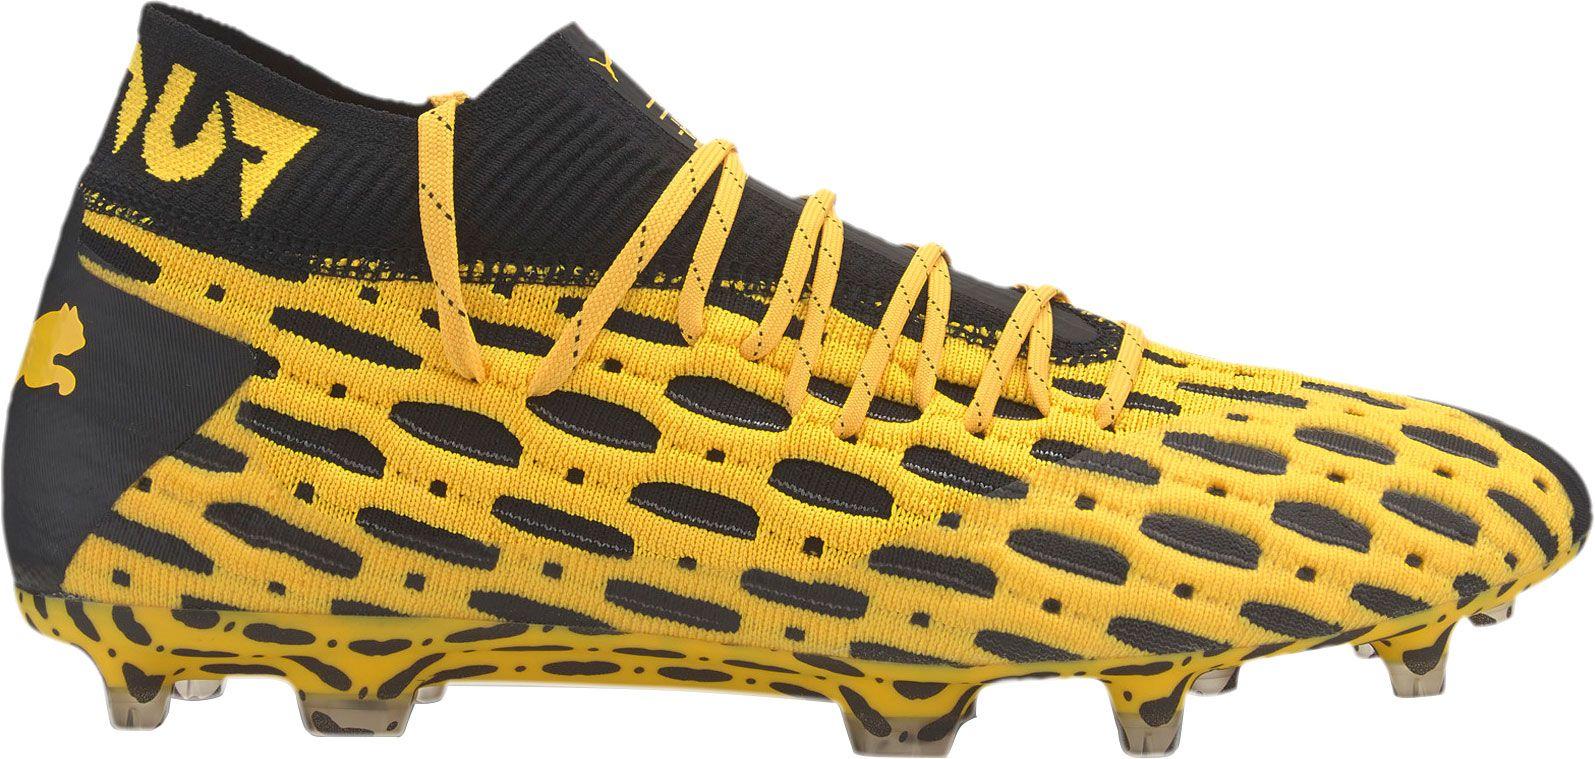 PUMA Men's Future 5.1 NetFit FG Soccer Cleats, Size: Small, Green